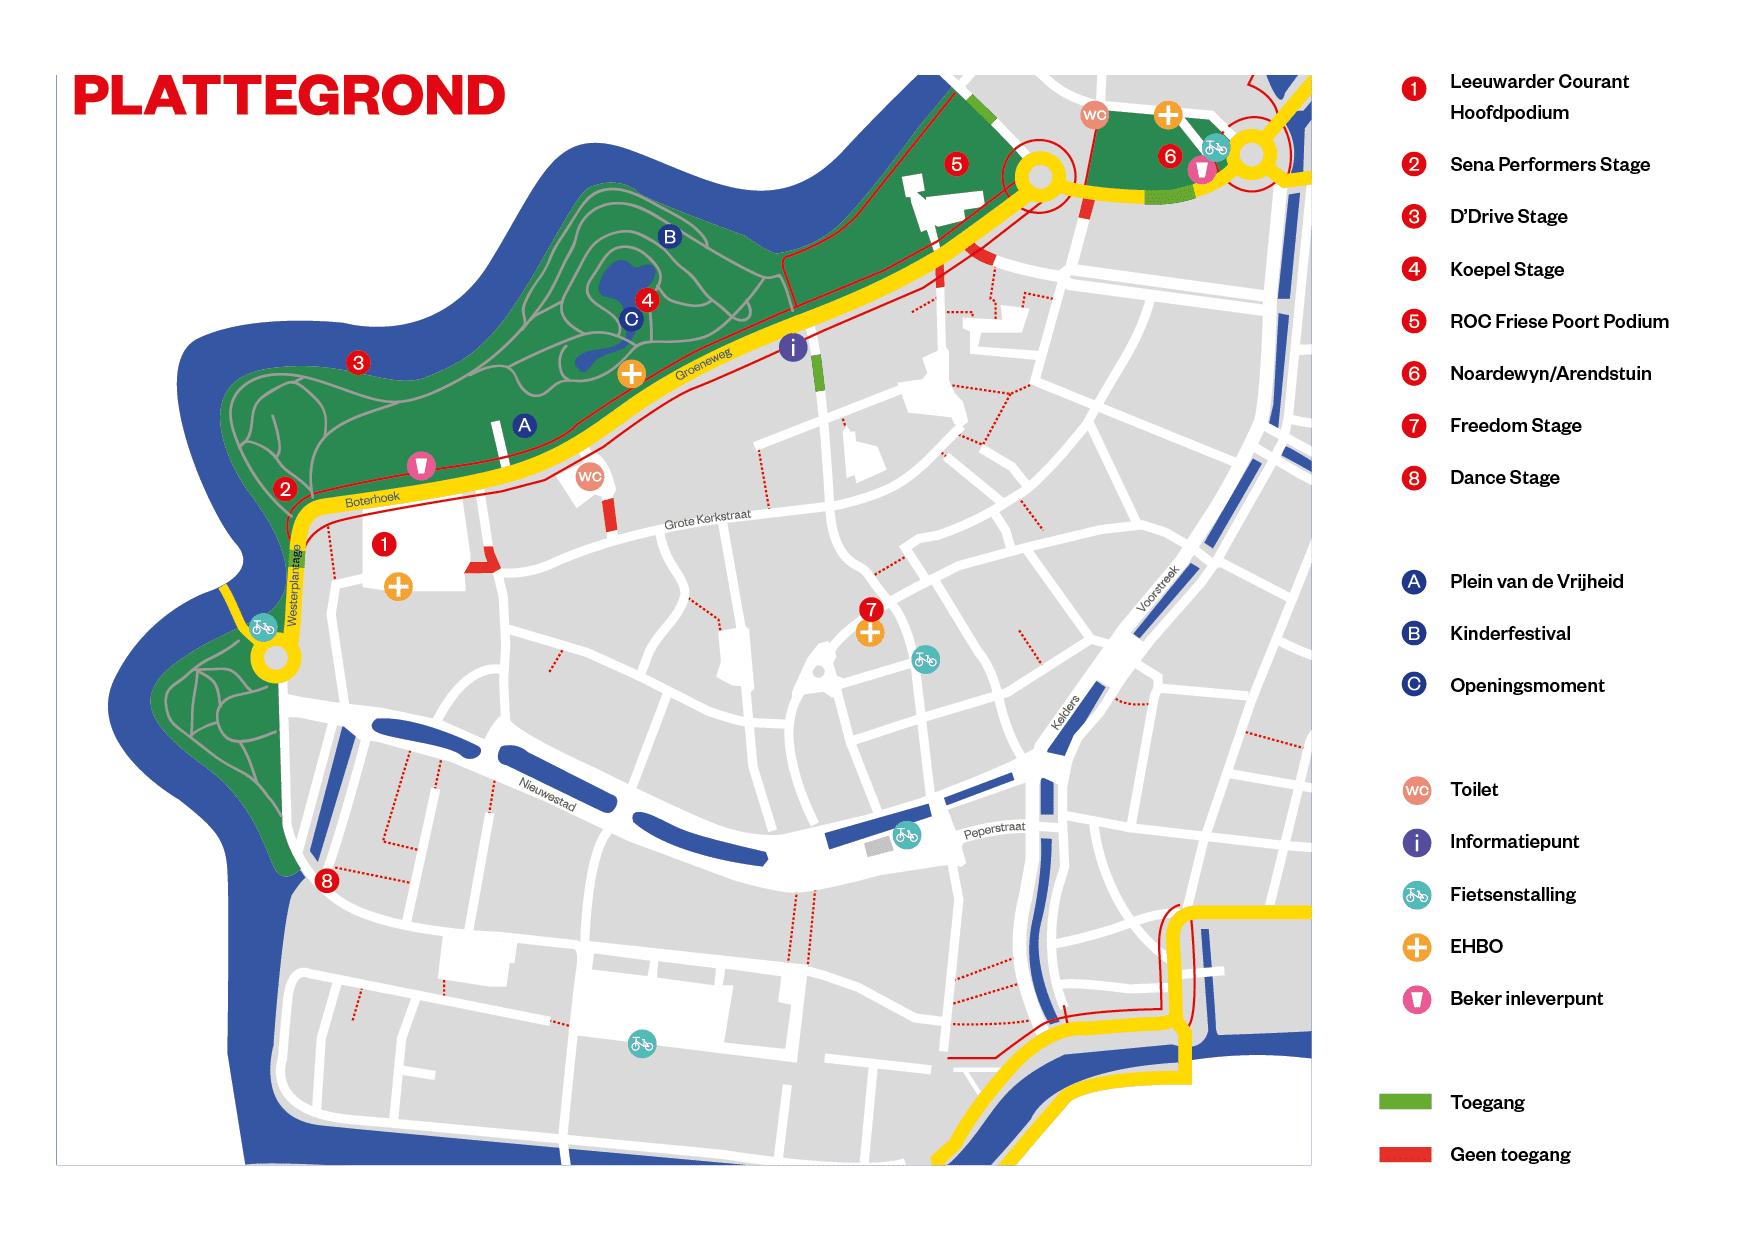 plattegrond bevrijdingsfestival fryslan